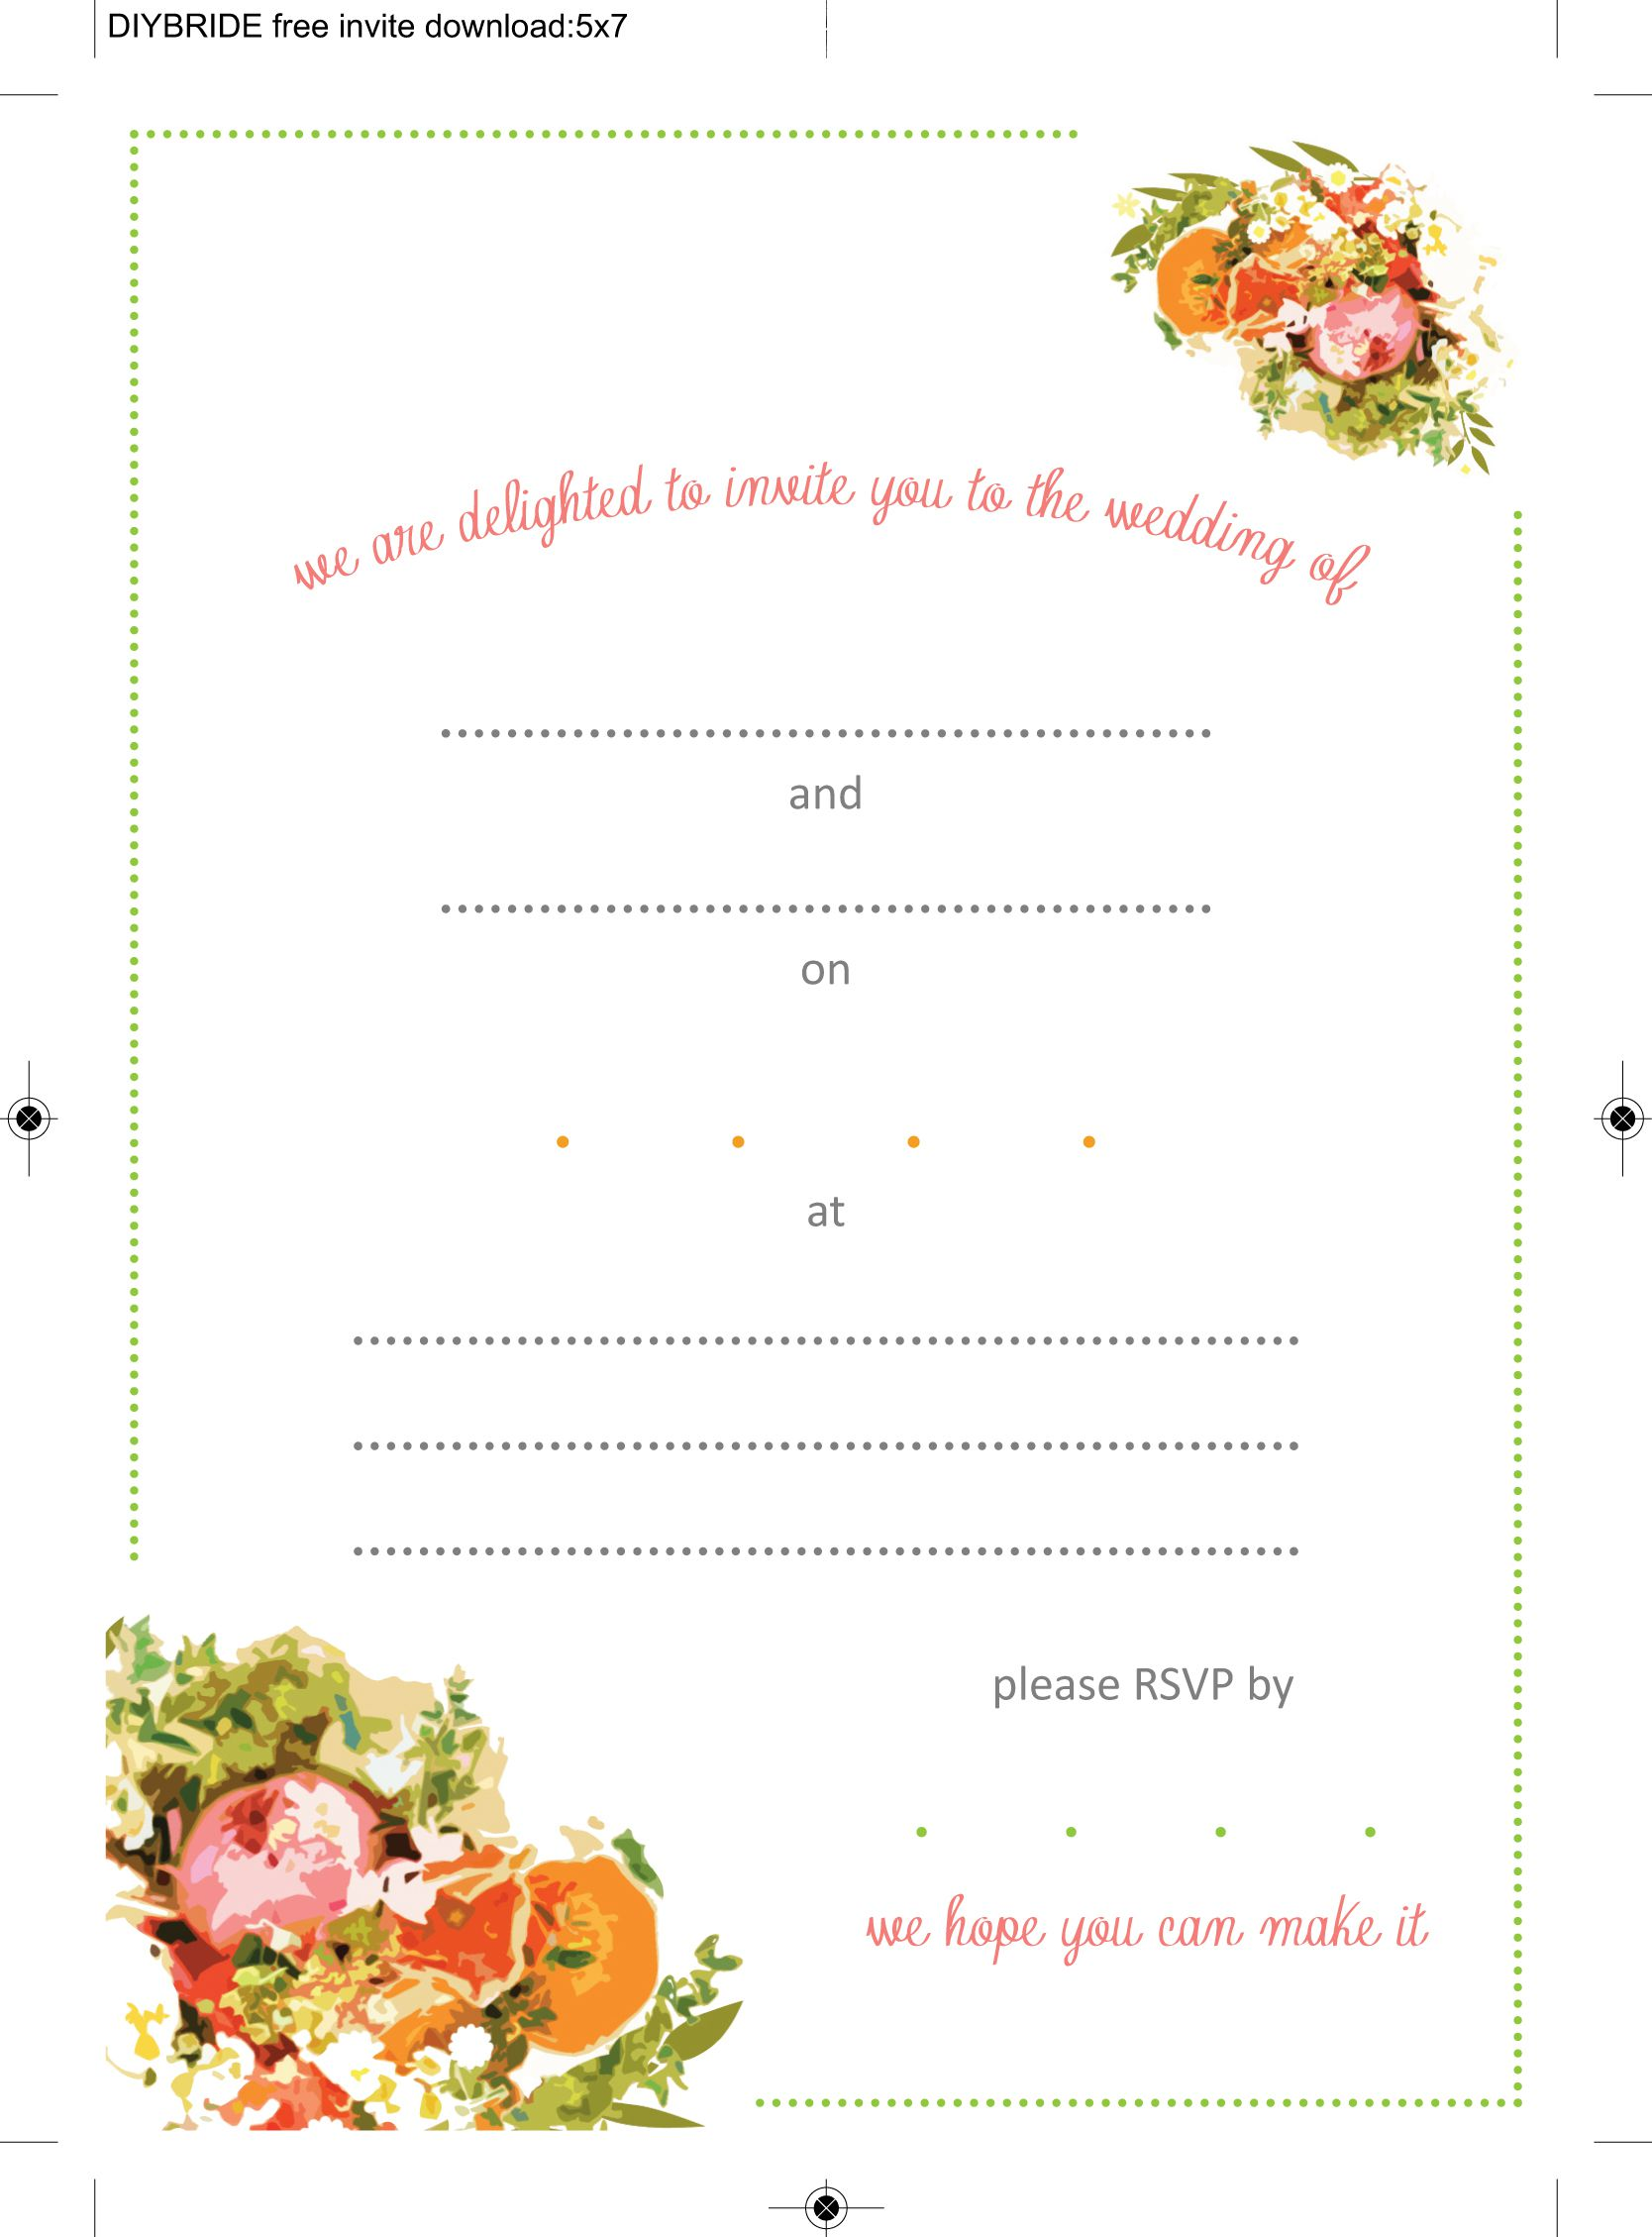 001 Stupendou Wedding Invitation Template Word High Definition  Invite Wording Uk Anniversary Microsoft Free MarriageFull